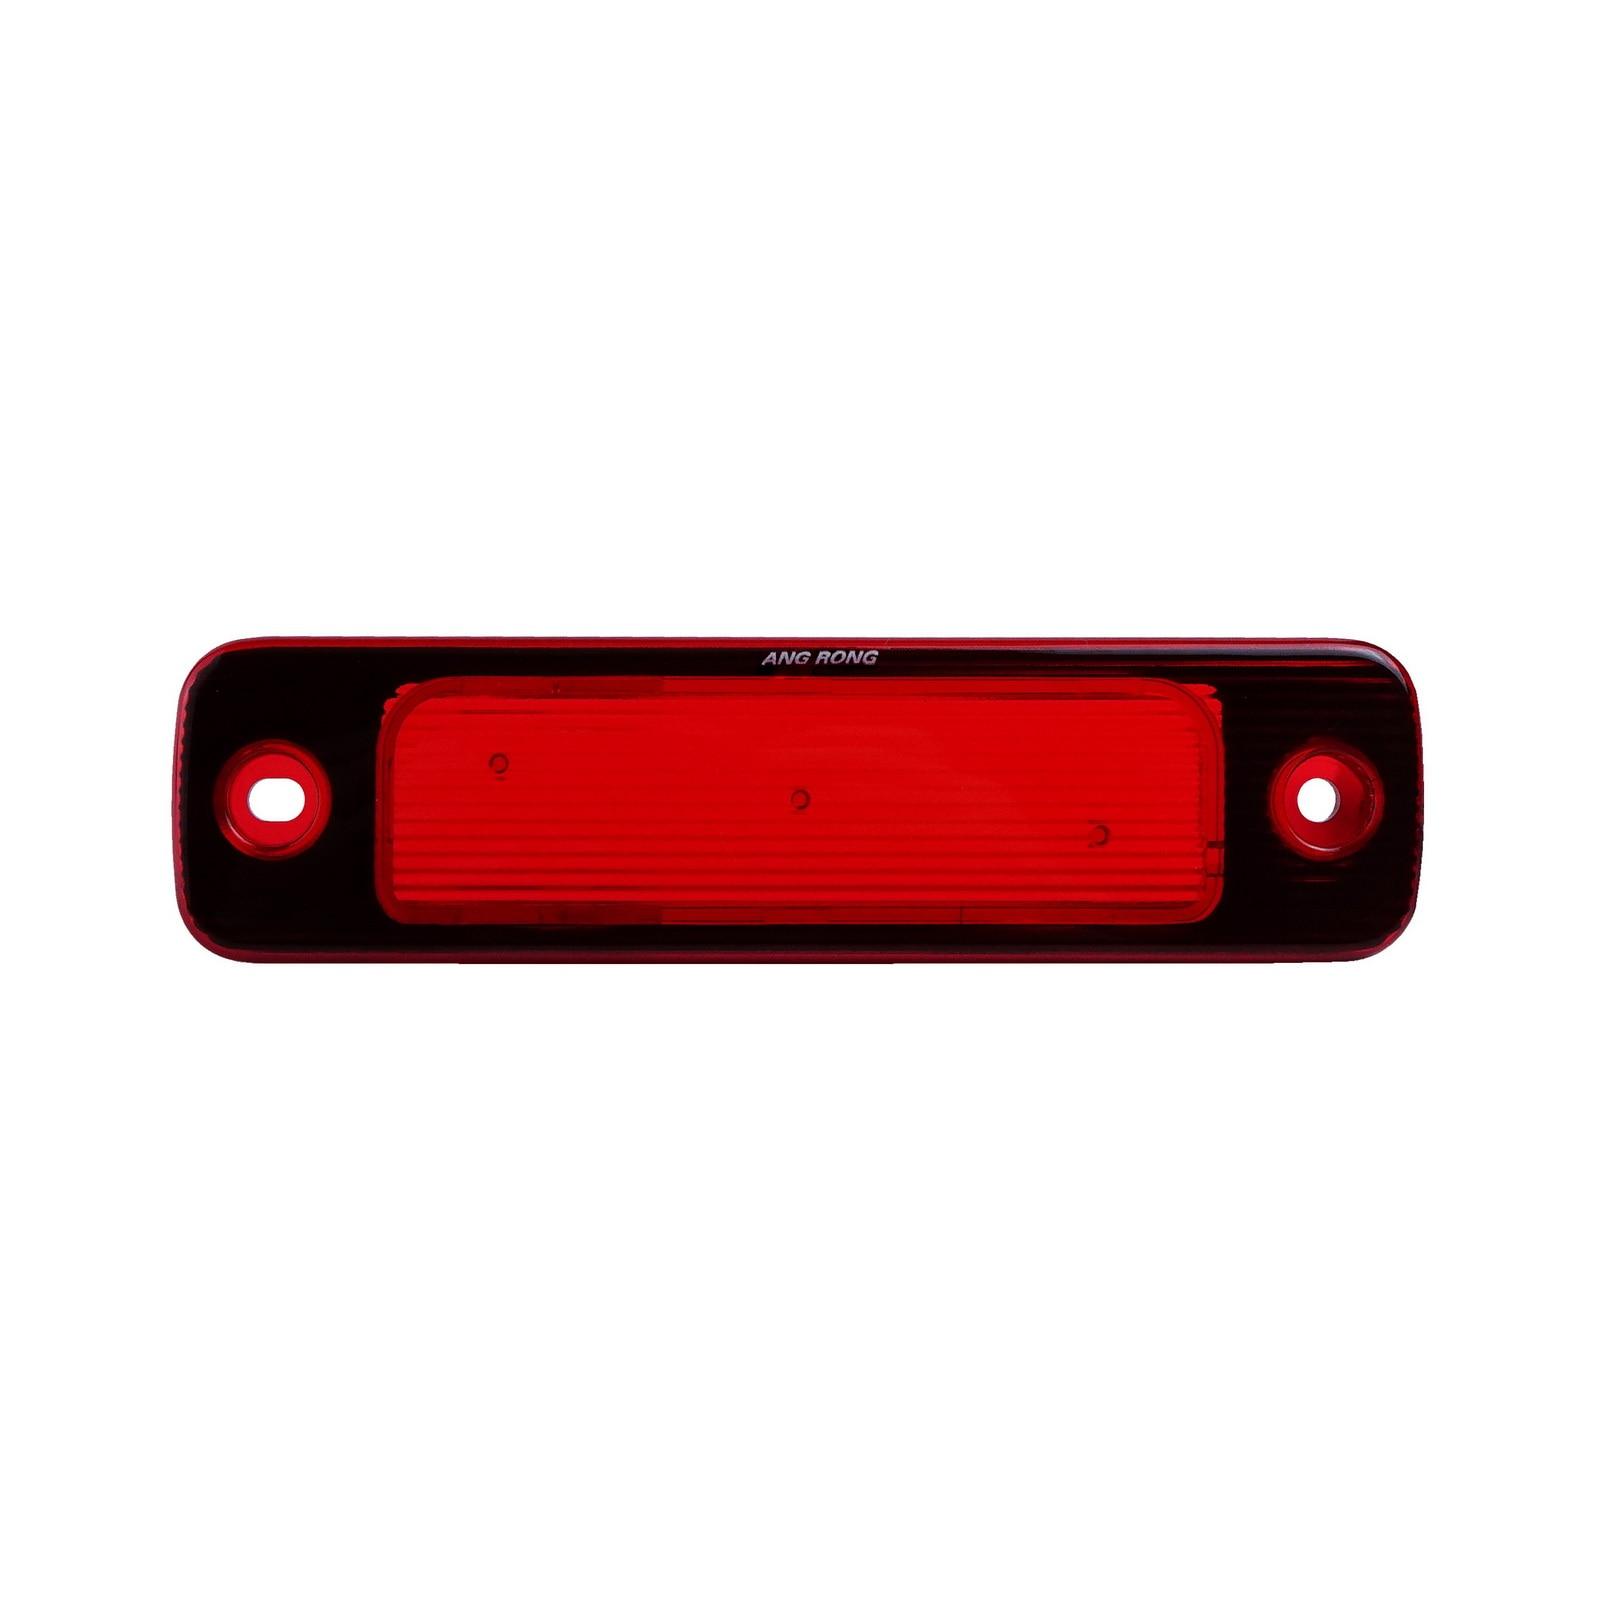 Pesi ZINCO Masserelle di equilibratura acciaio 5g 10g 15g 20g 25g 30g per 25 St 150 pezzi